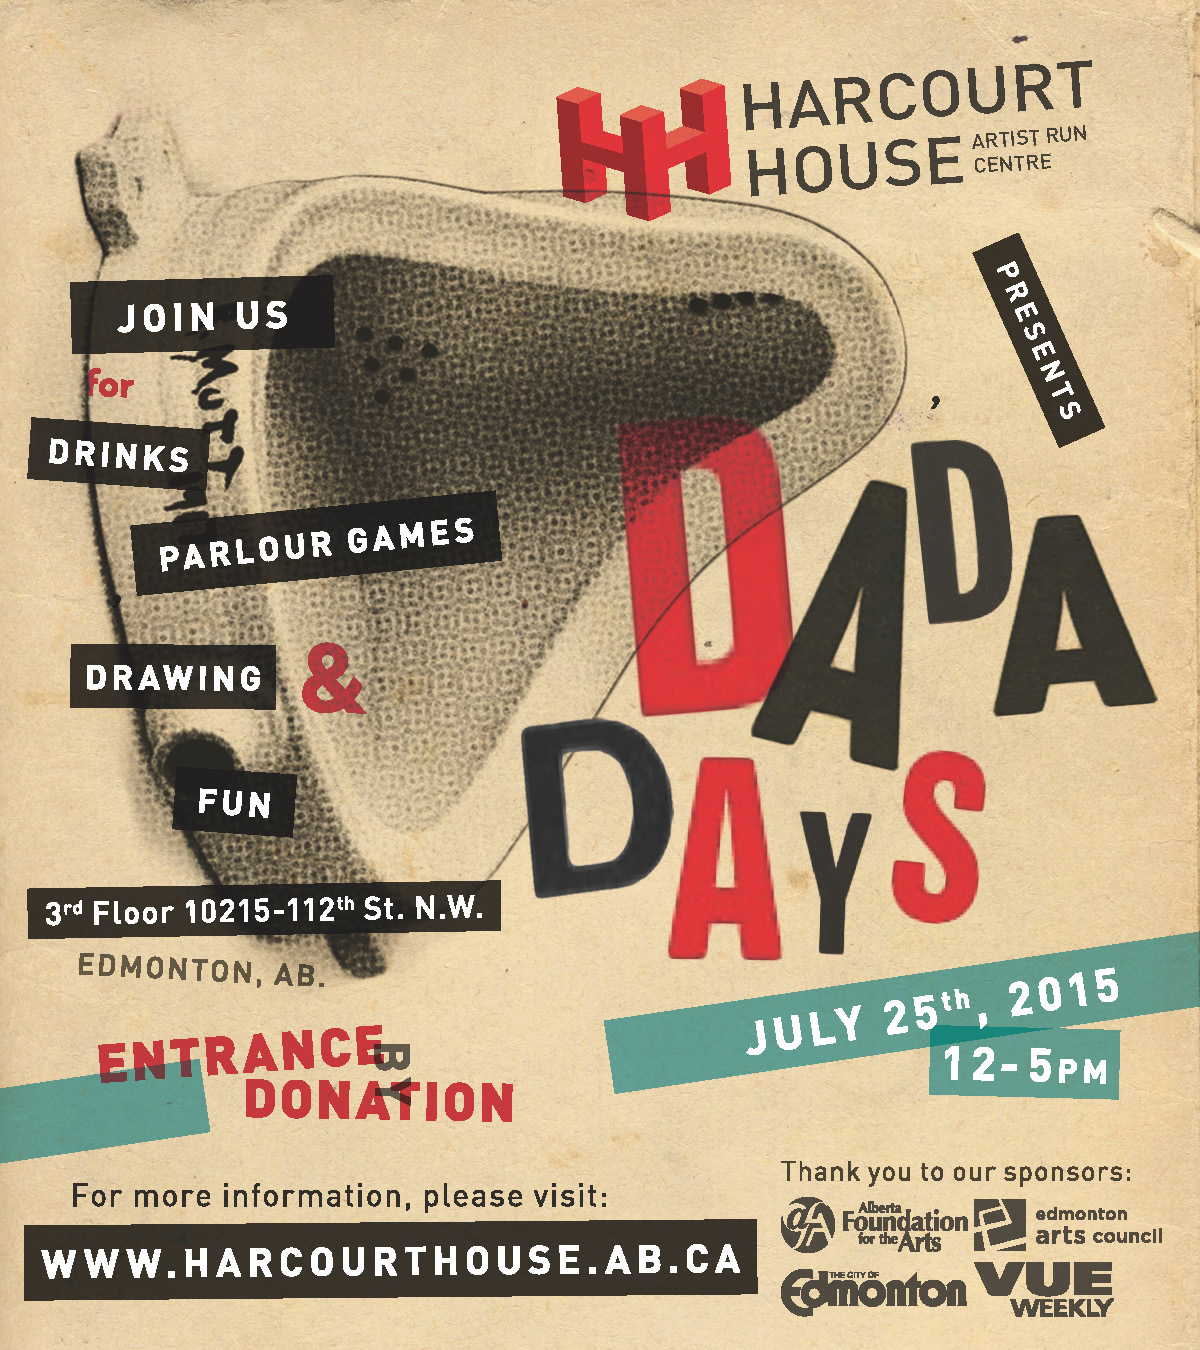 dada days june 25th 12 5pm harcourt house artist run centre